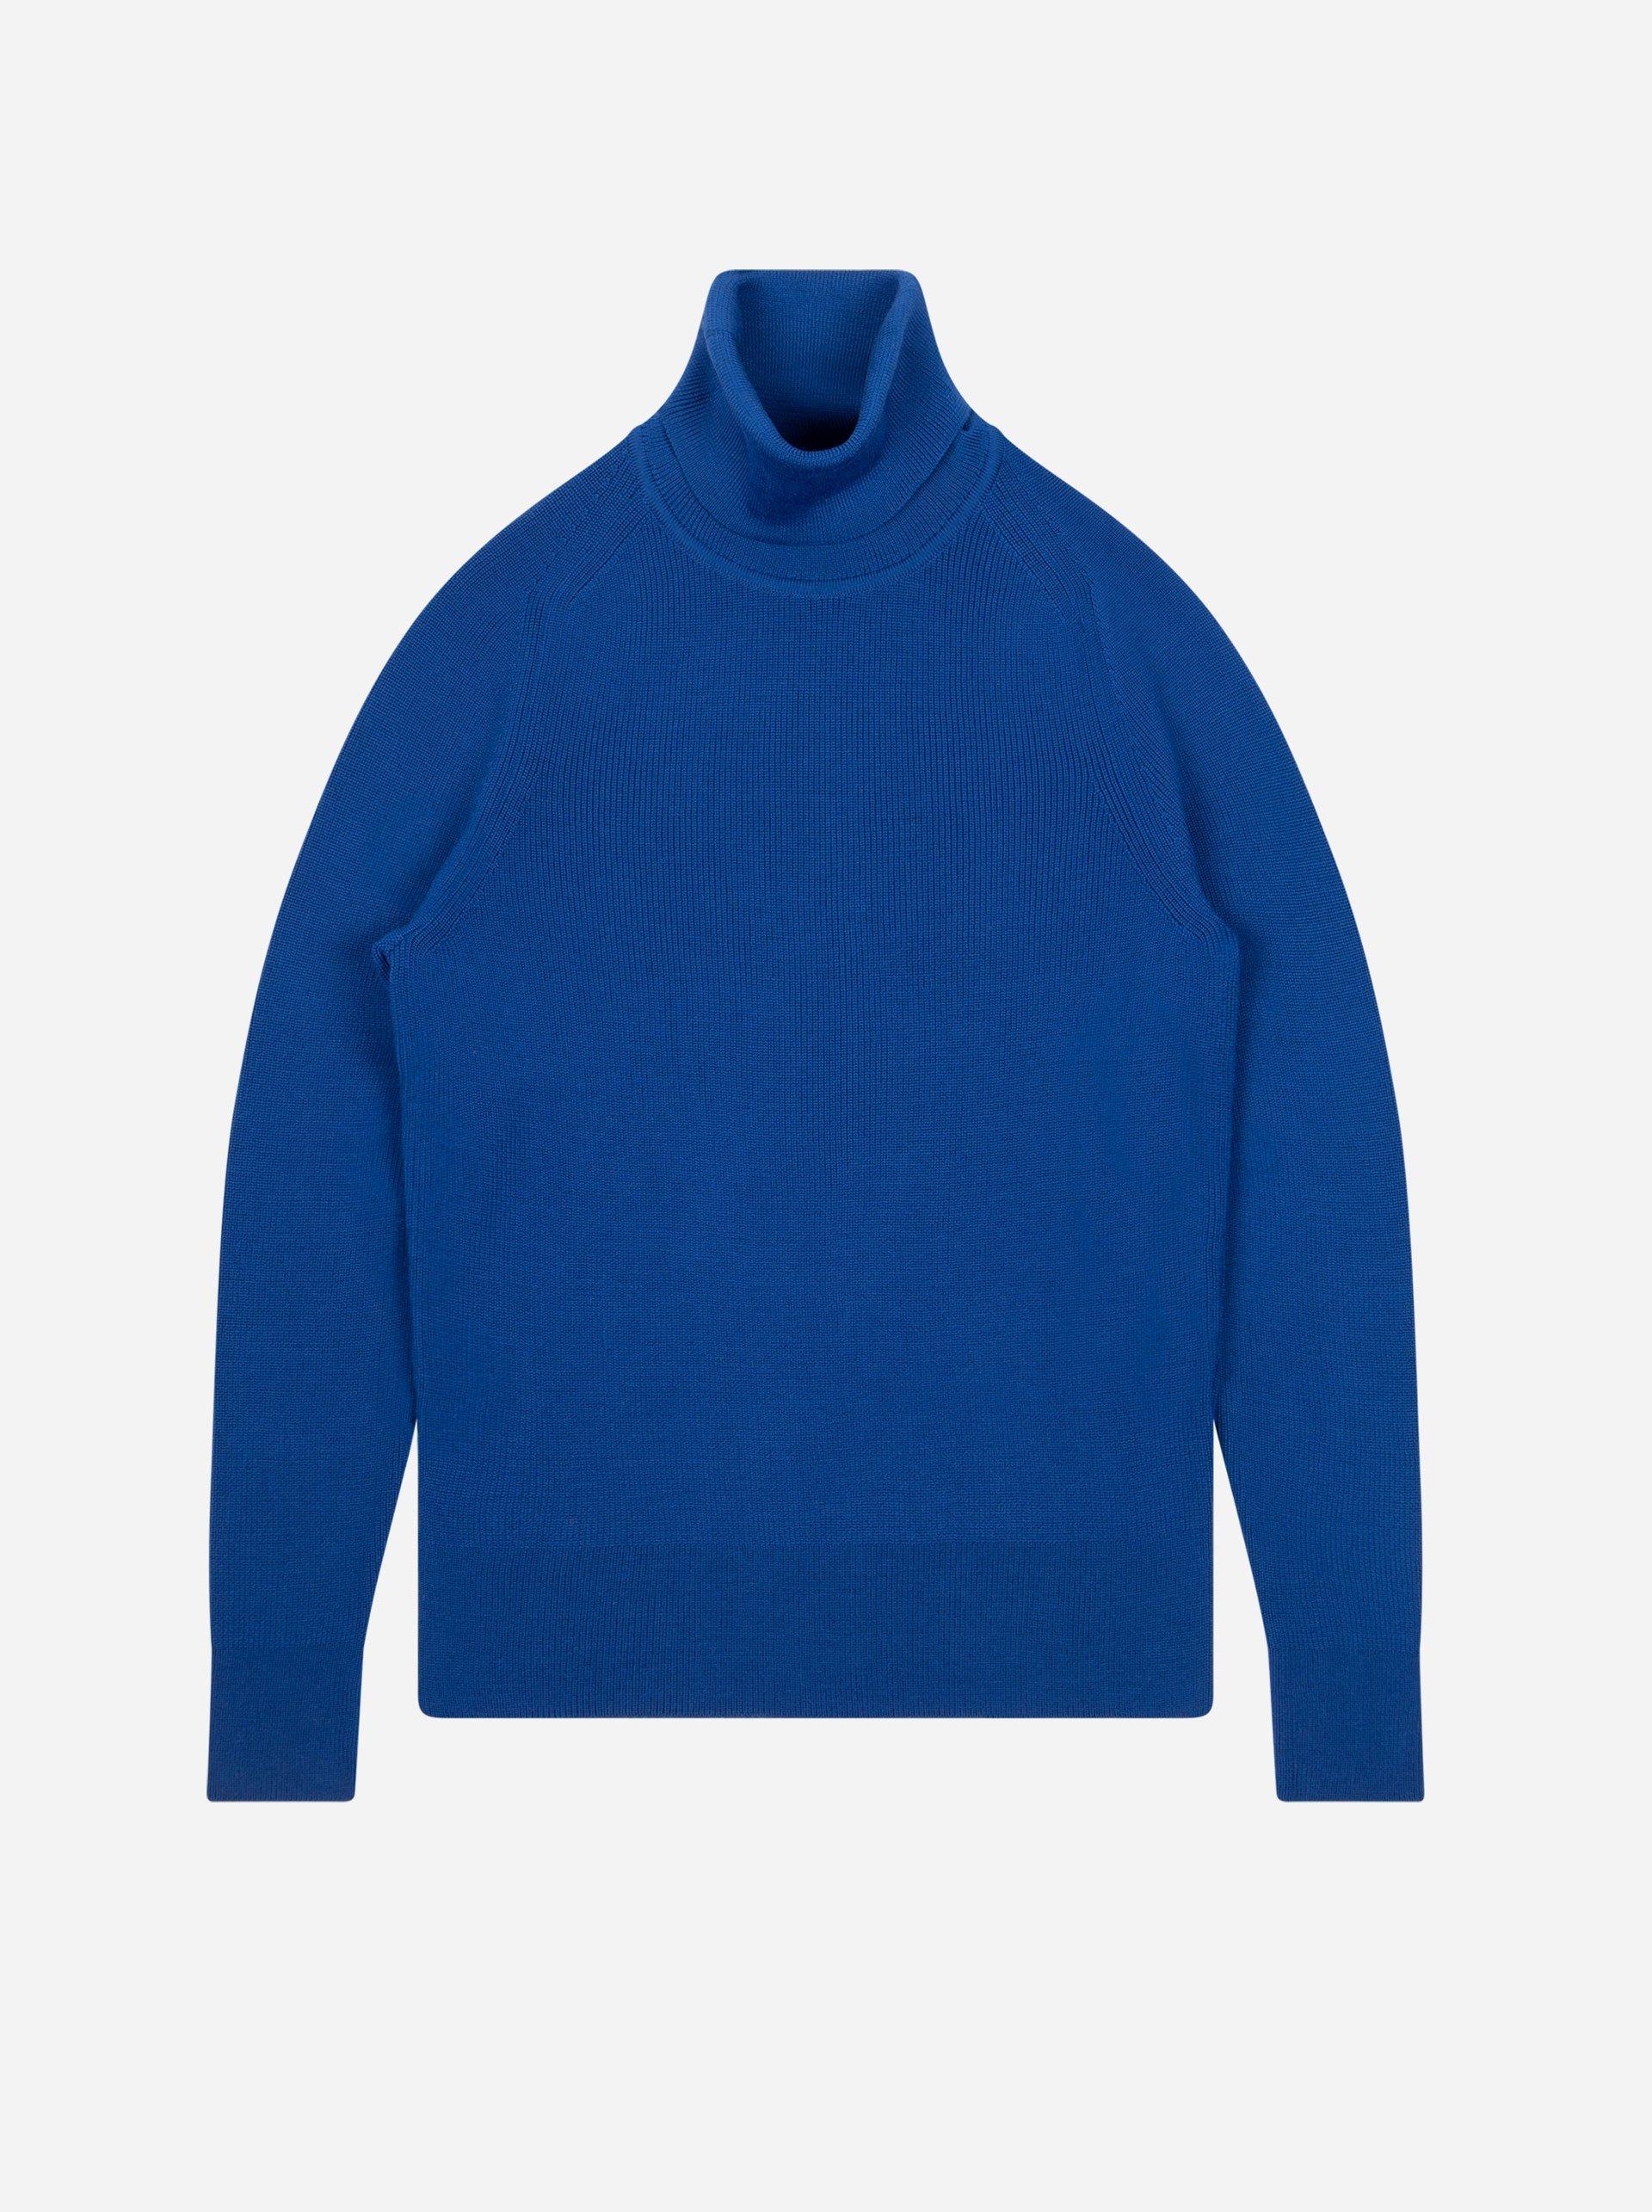 Teym - Turtleneck - The Merino Sweater - Men - Cobalt blue - 4